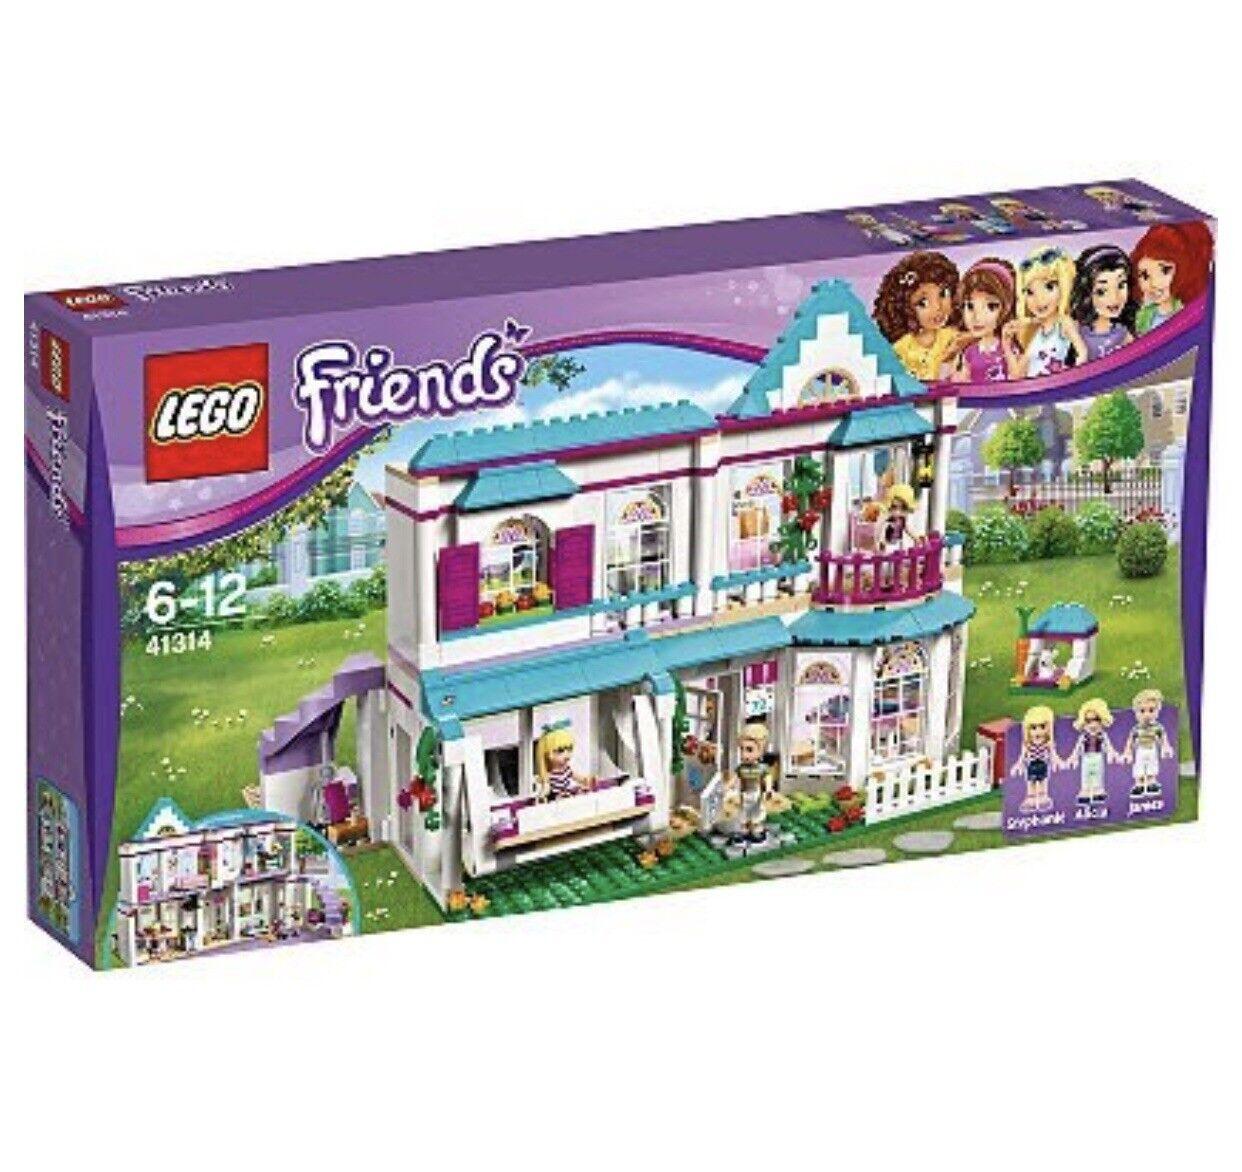 LEGO Friends Stephanie's House 41314-Brand New Sealed Box